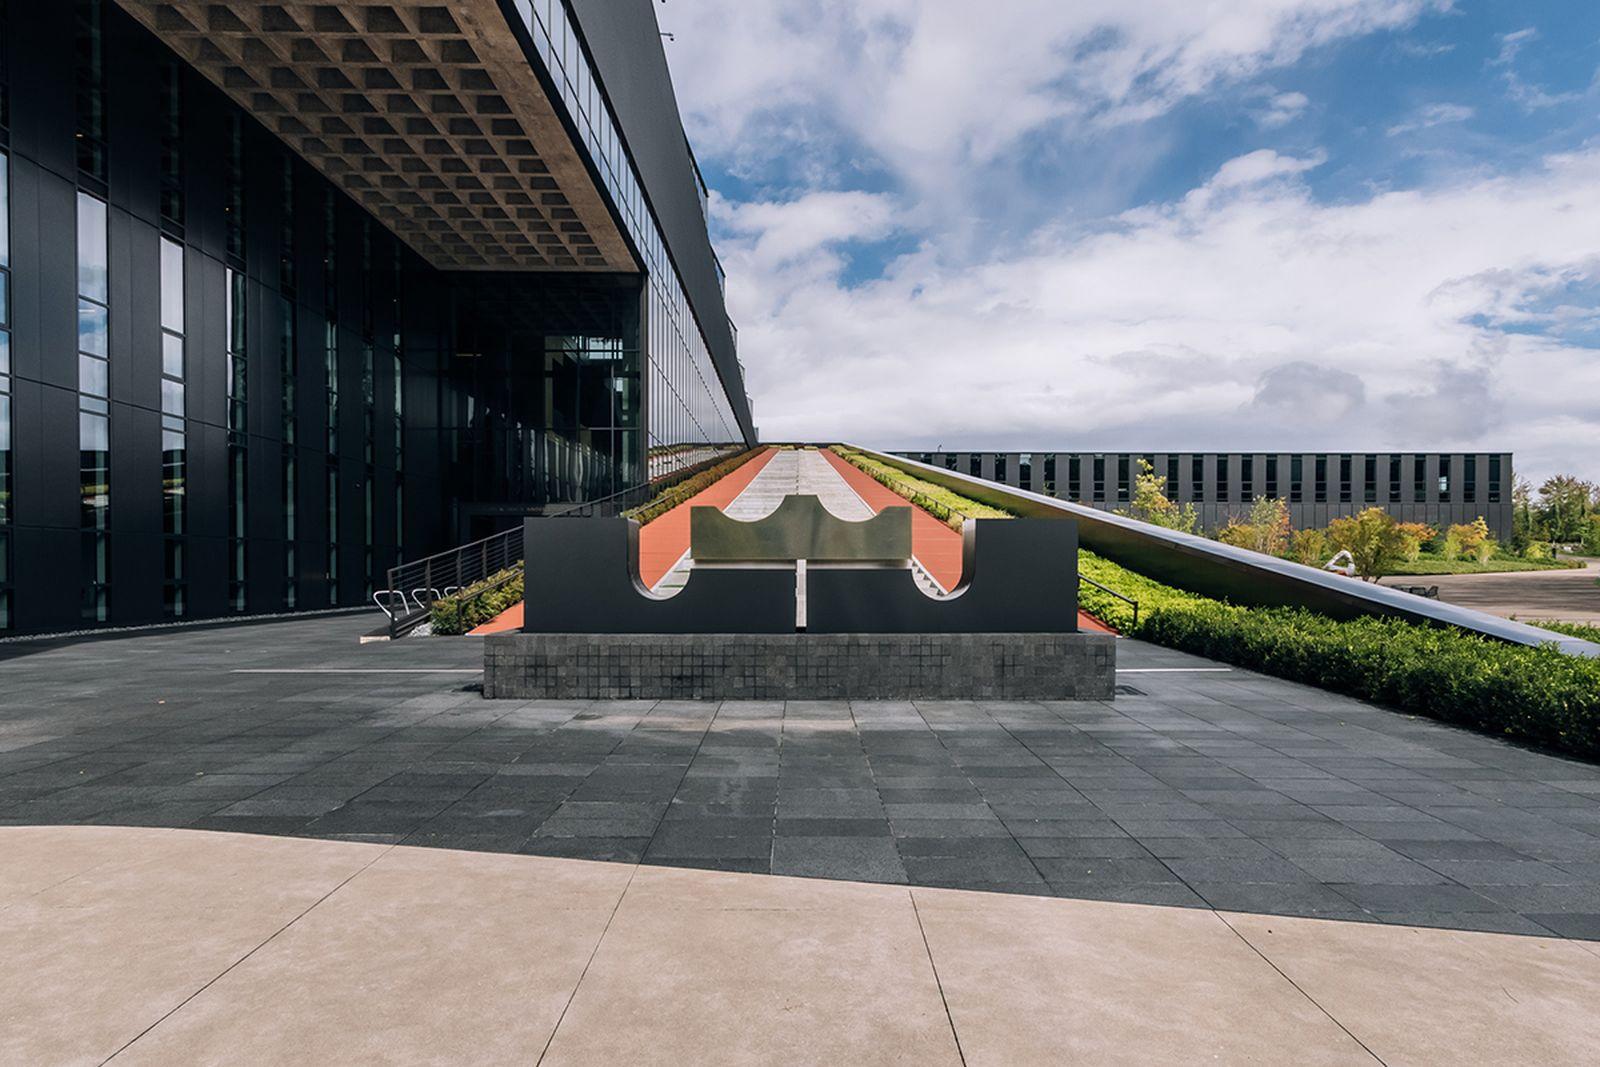 nike-lebron-james-innovation-center- (6)